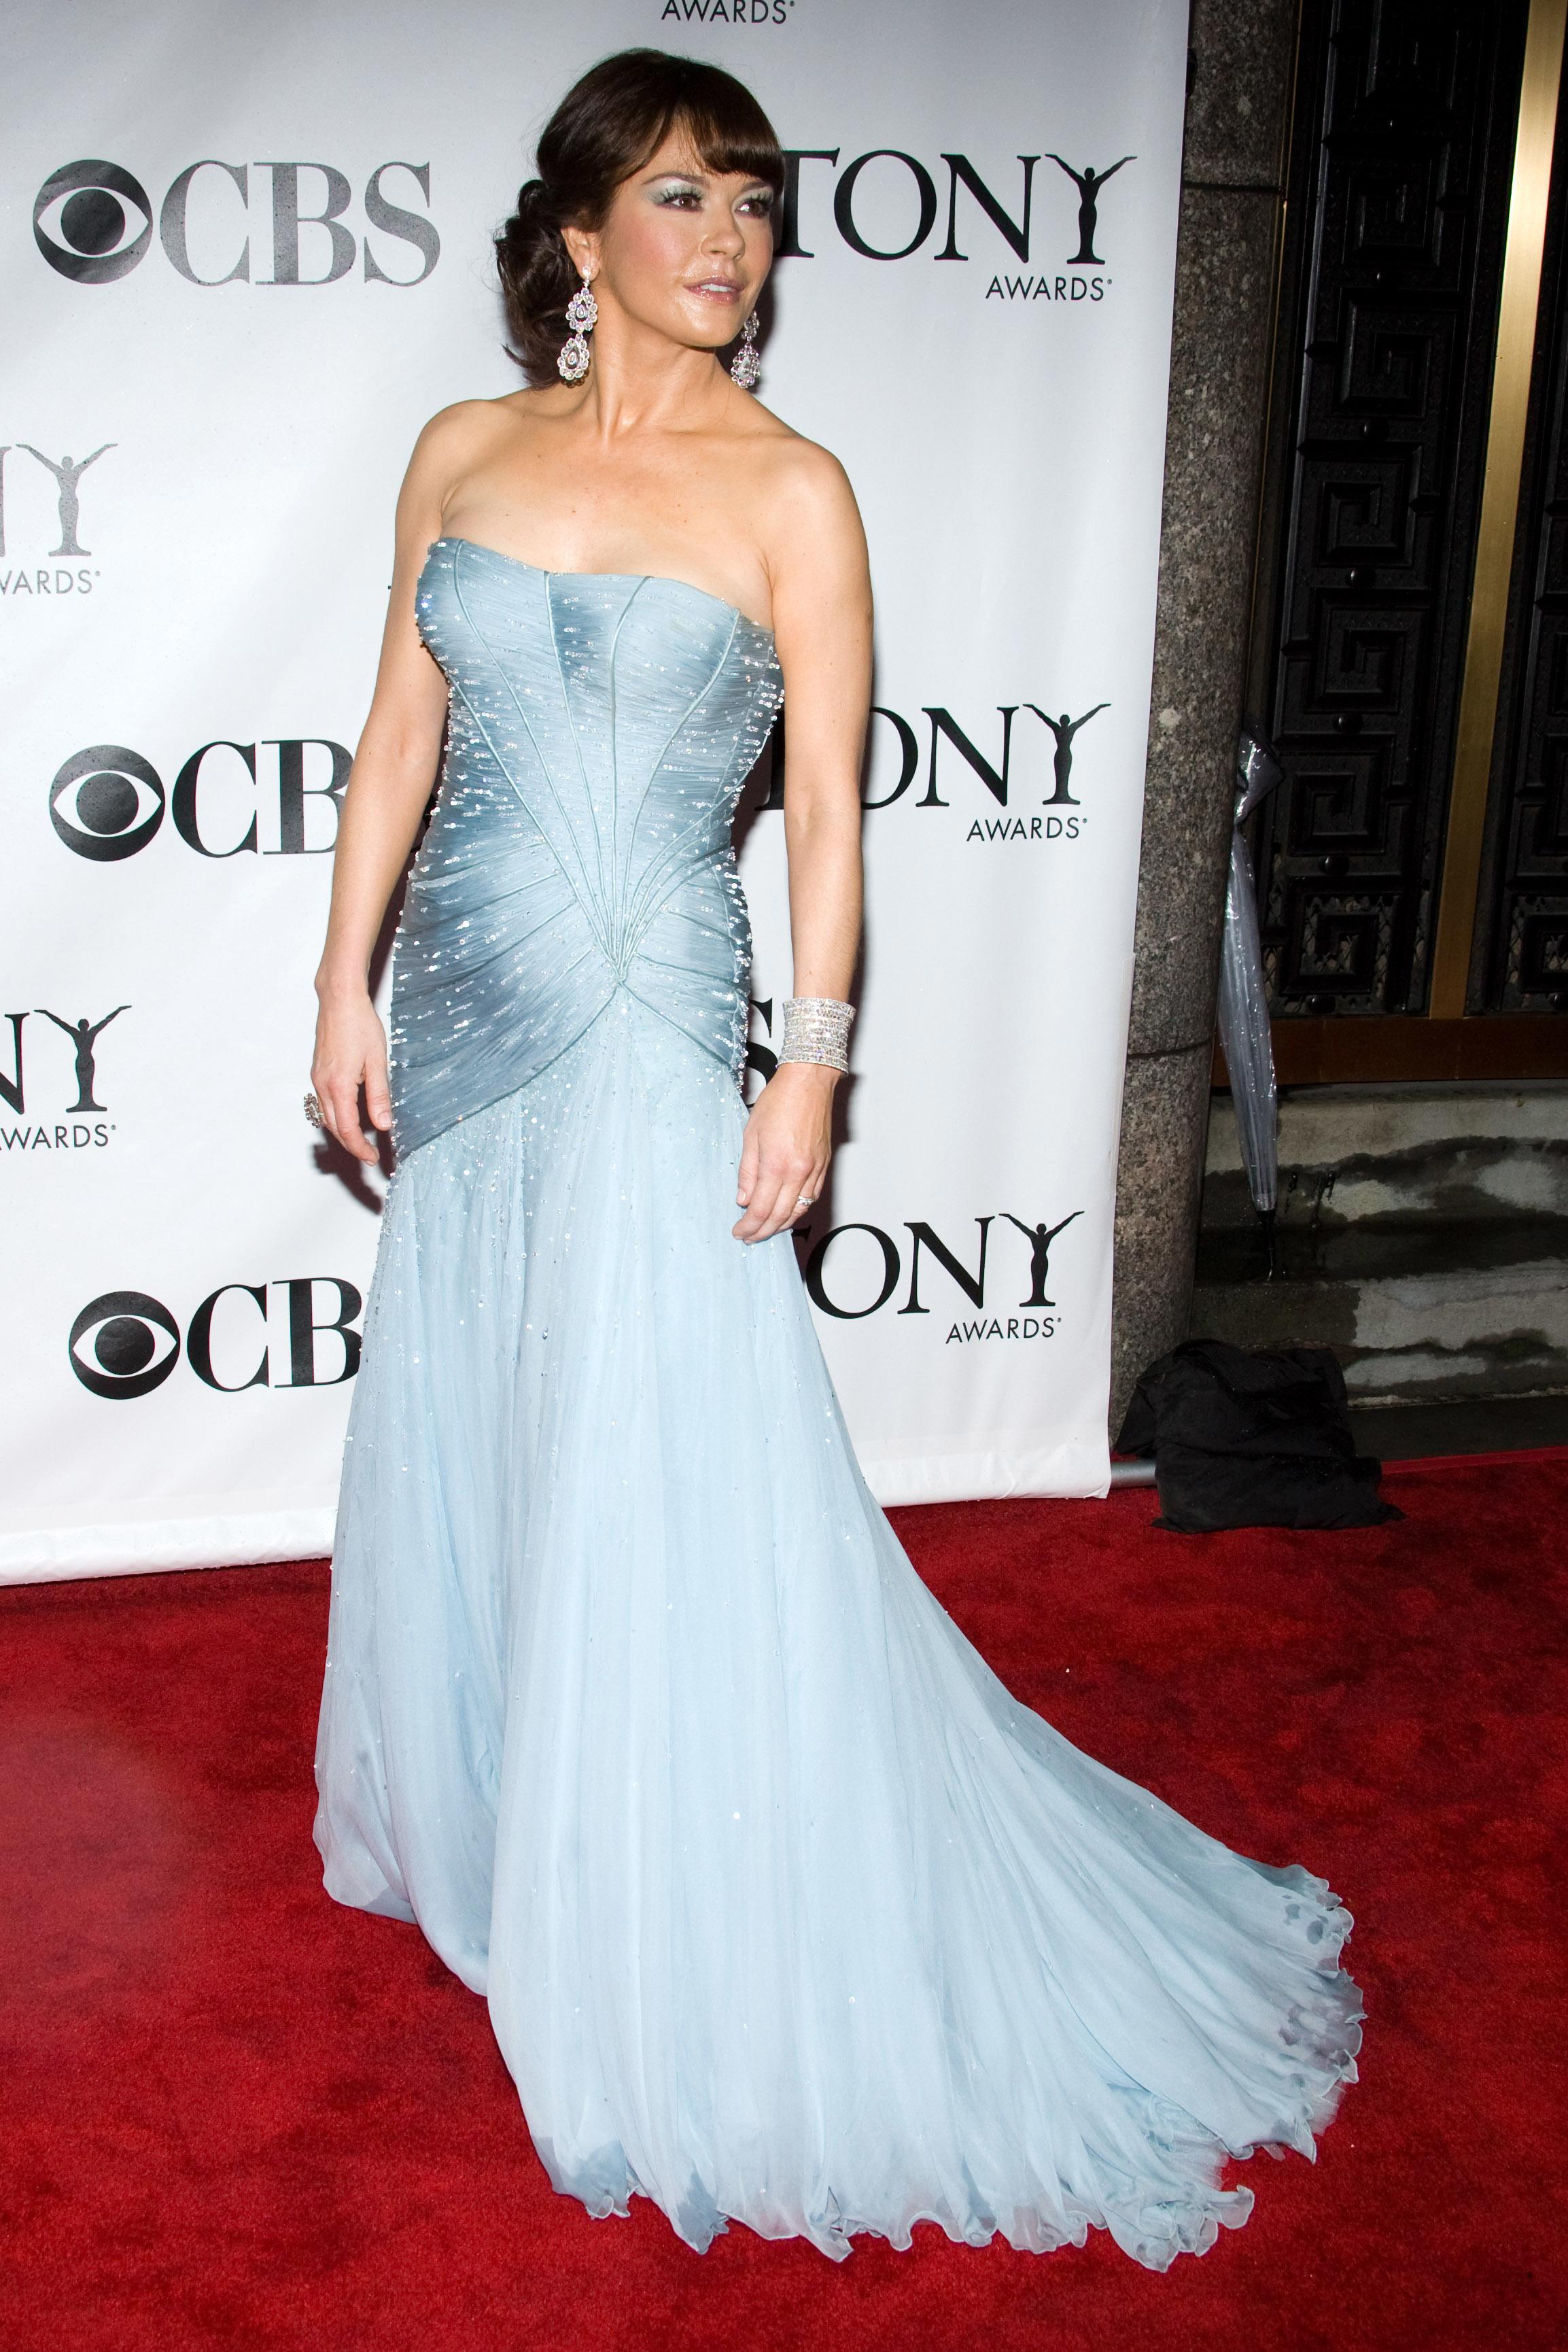 Catherine Zeta Jones attends the 64th Annual Tony Awards in New York City on June 13, 2010.